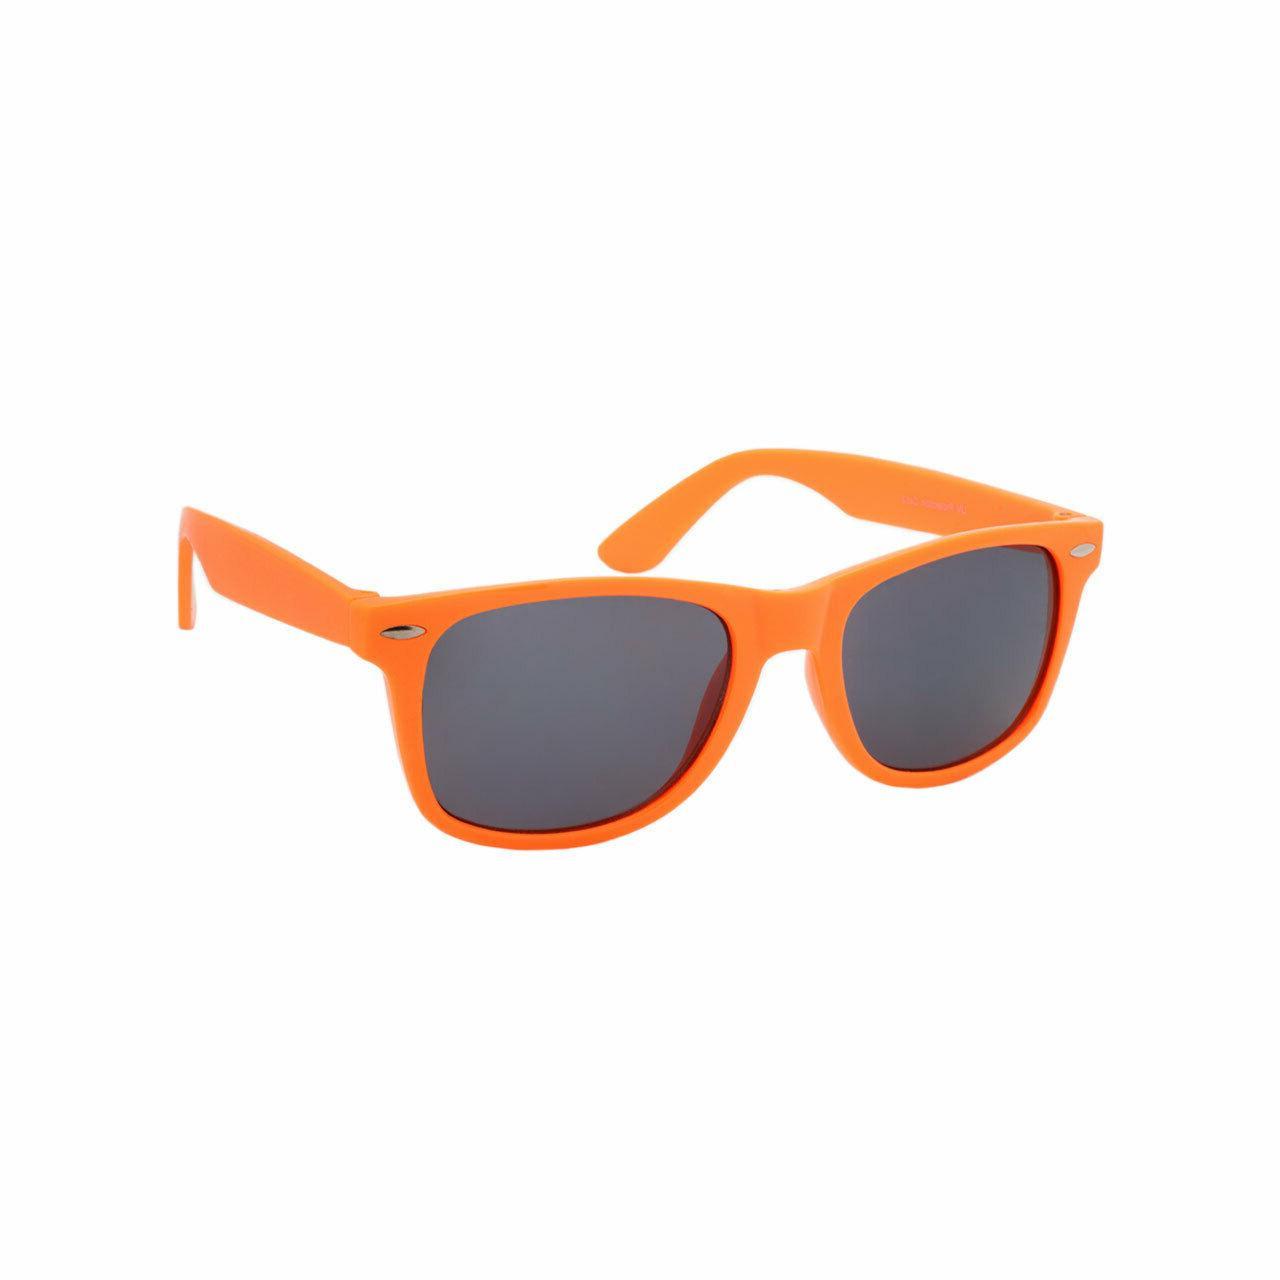 Bulk Sunglasses 36 PC Assorted Styles Unisex Men Styles